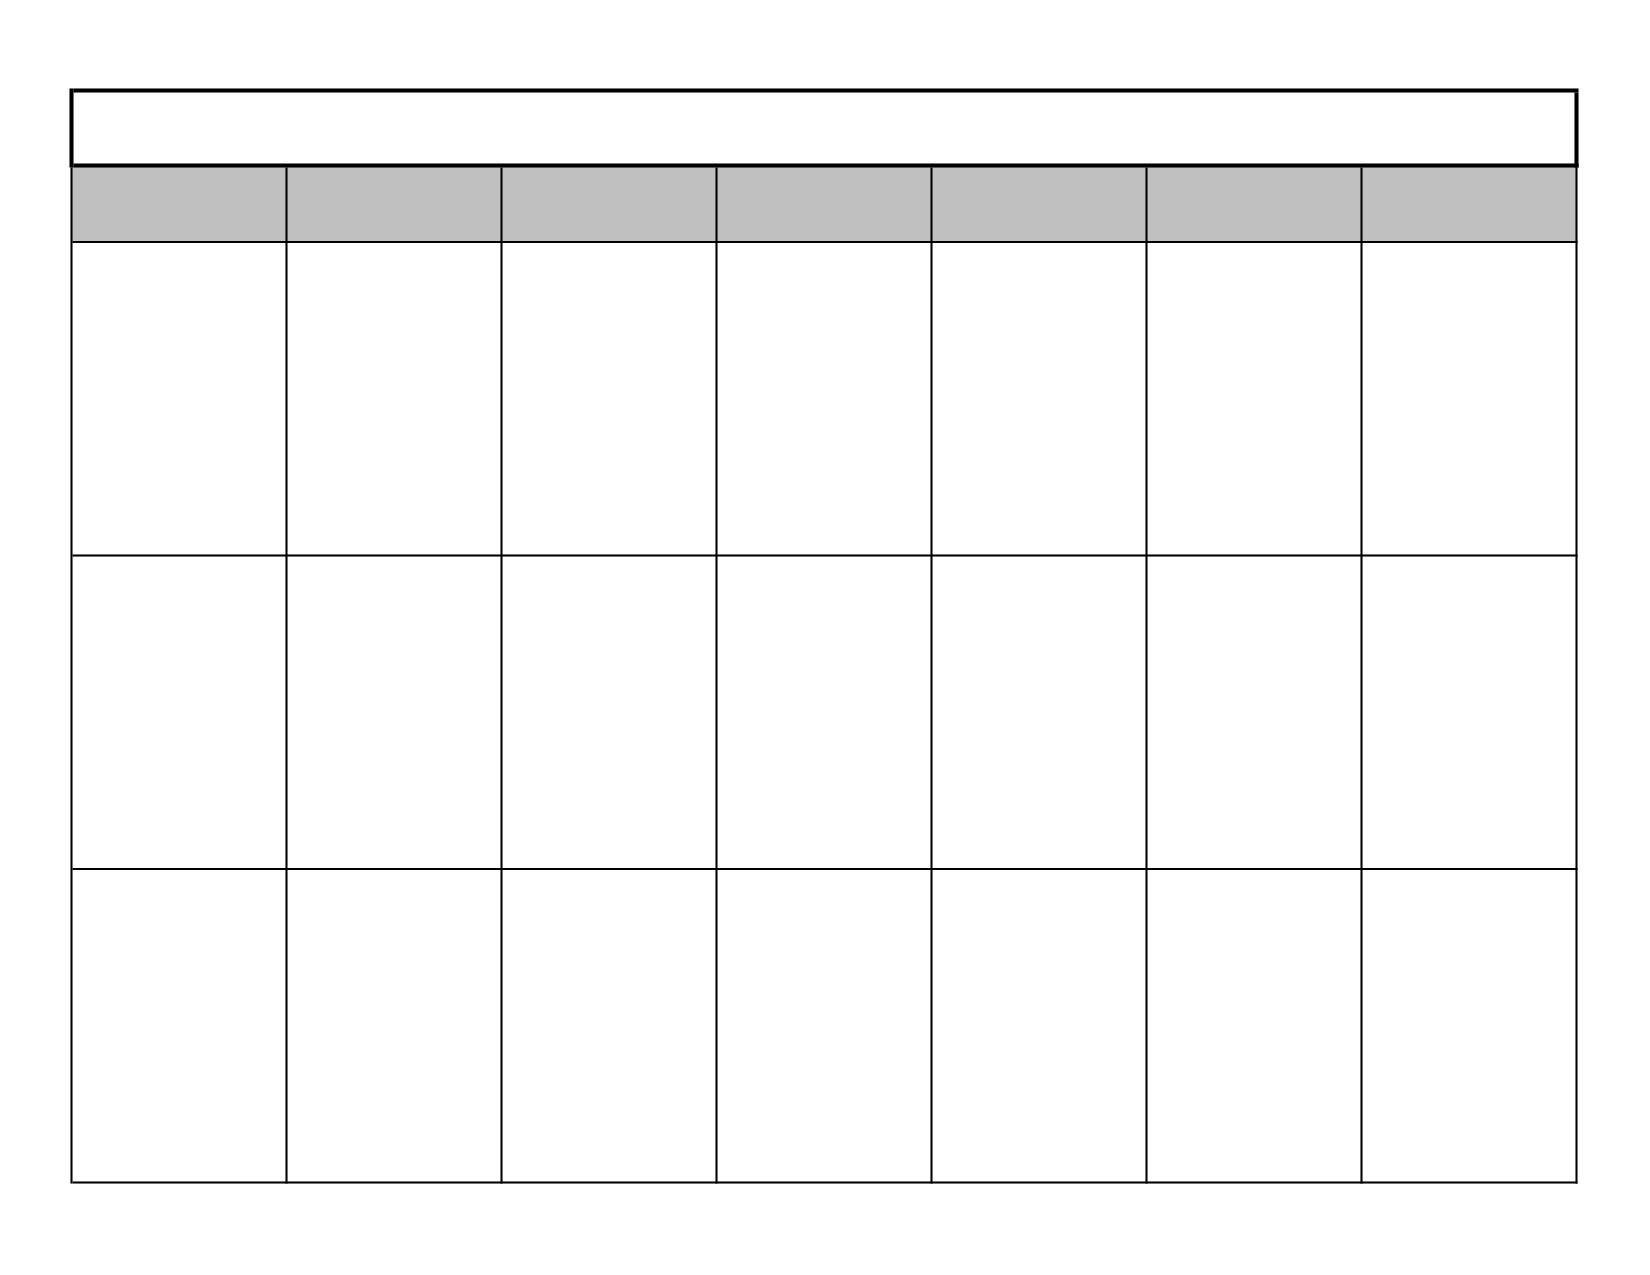 16 Blank Printable Weekly Calendars Templates Images - Blank